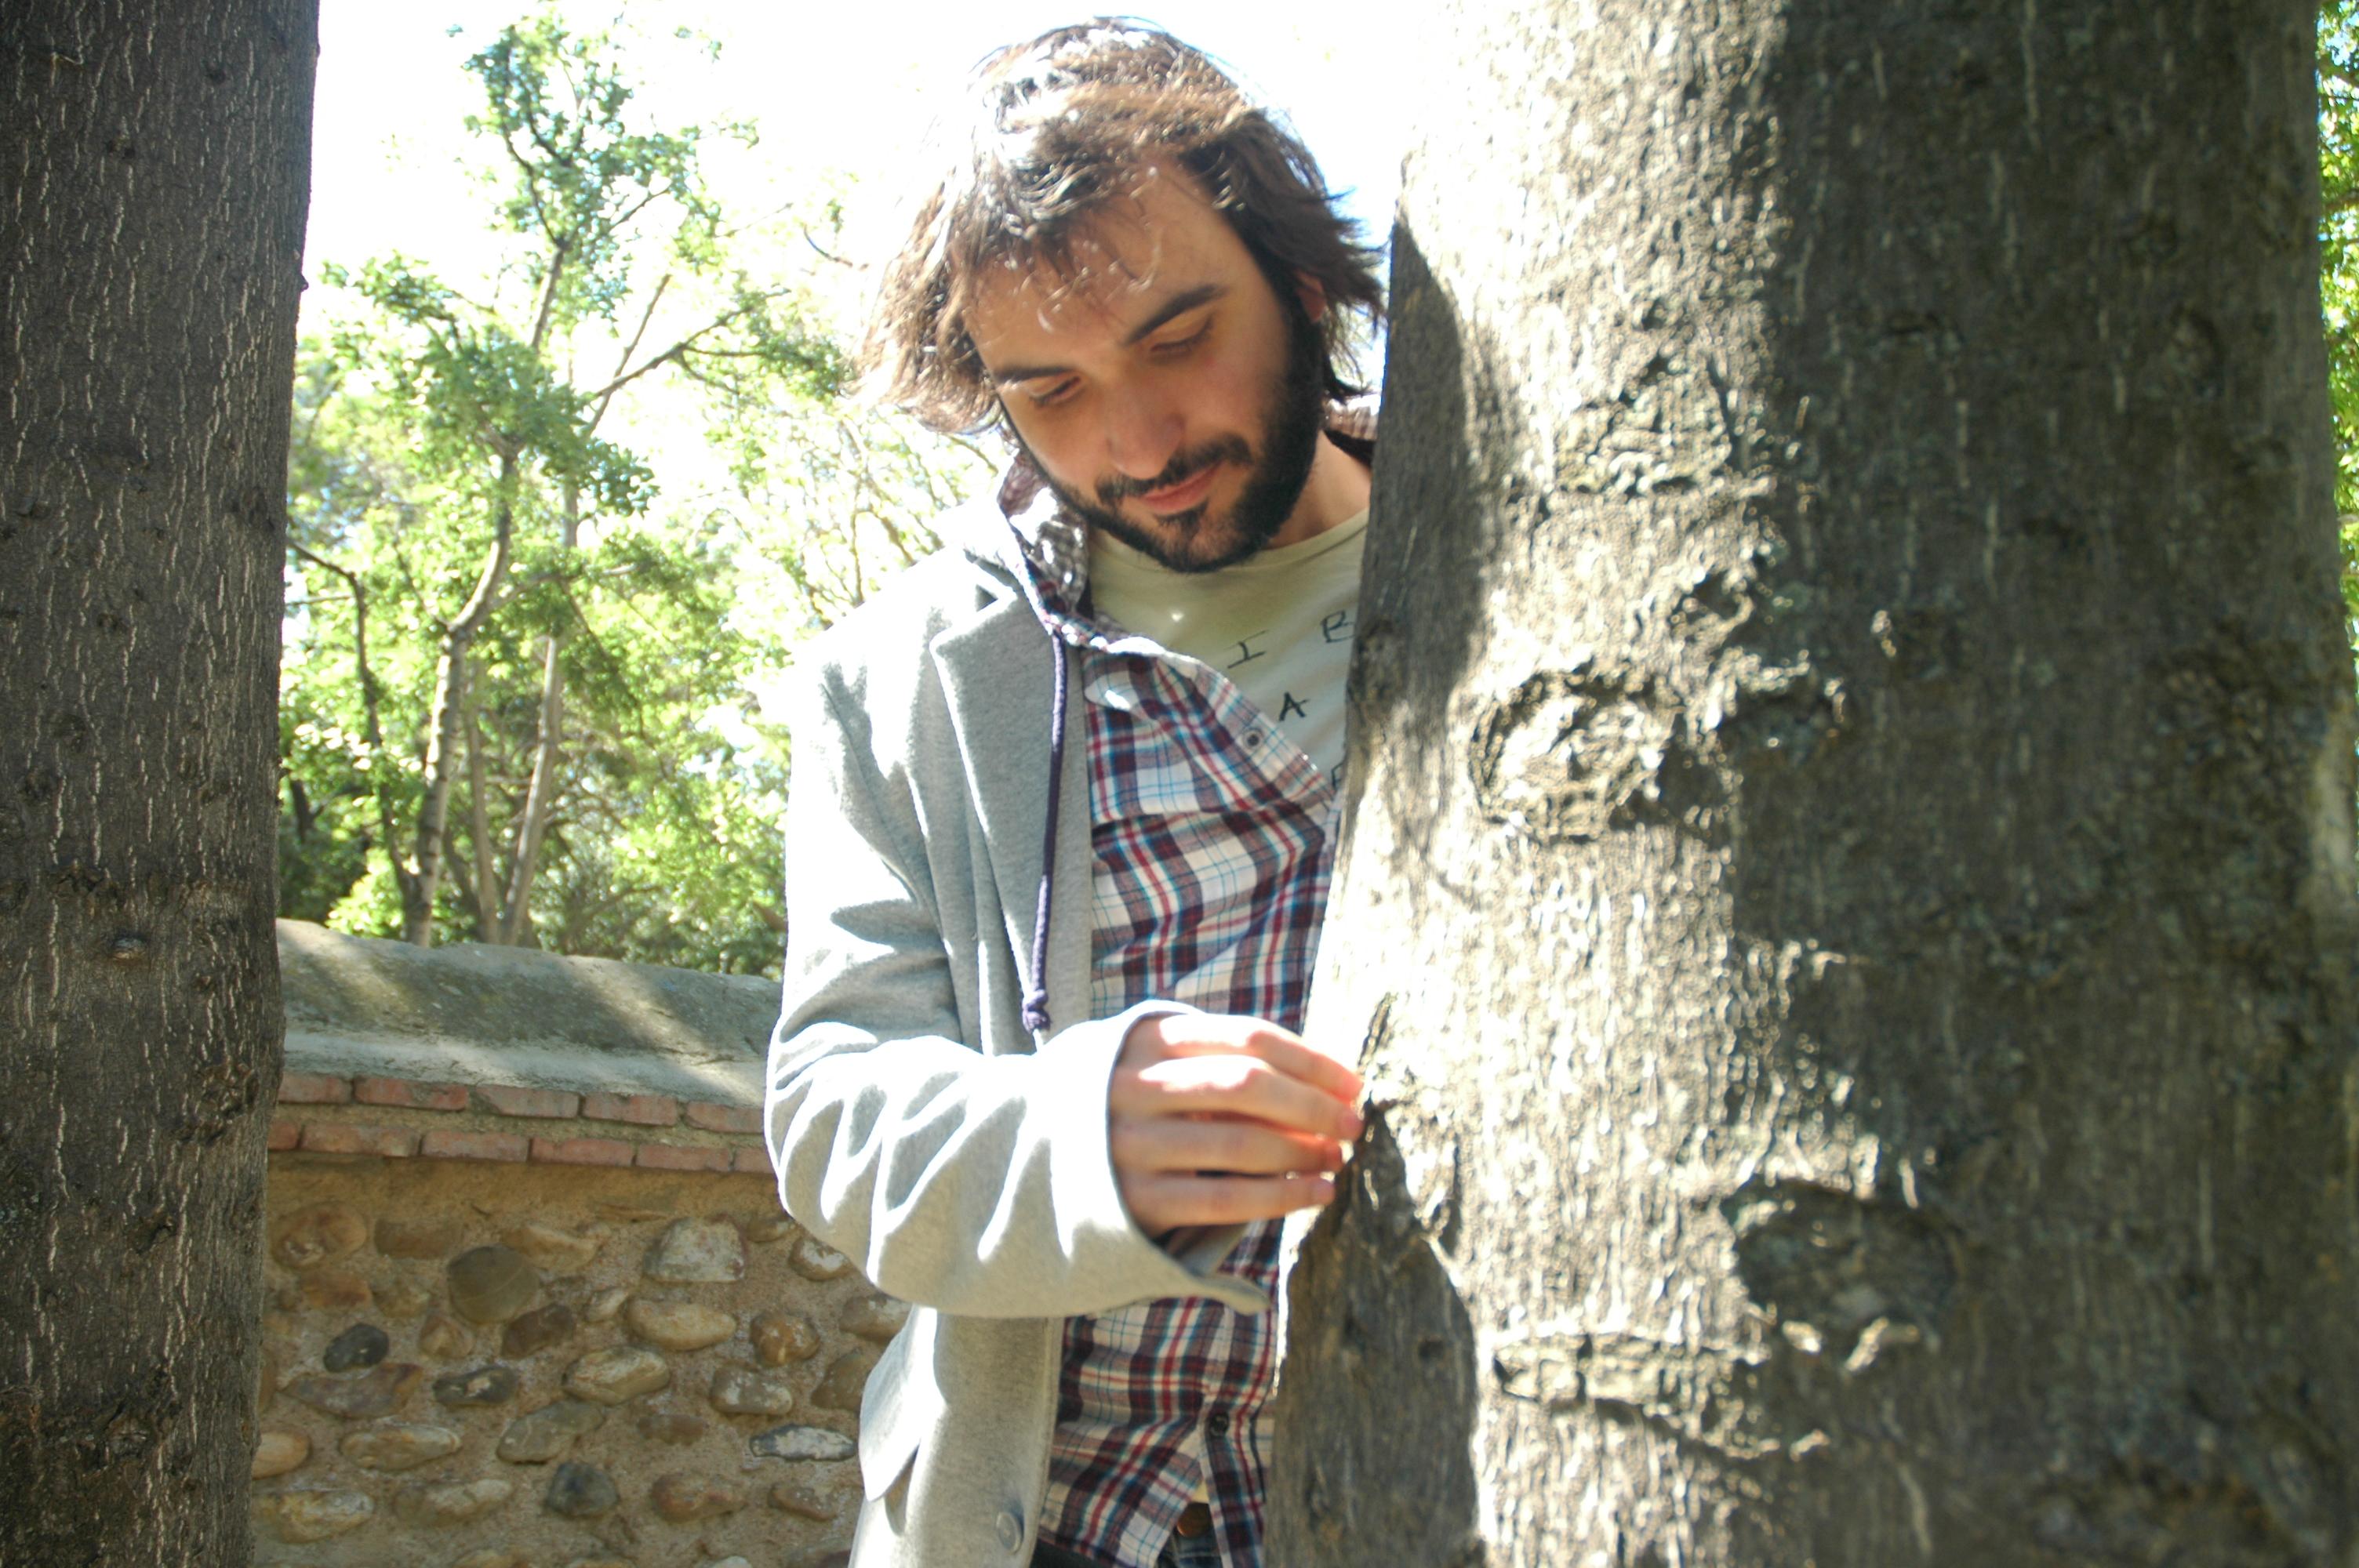 Book_1_David_Pallás_Gozalo_Parque_74